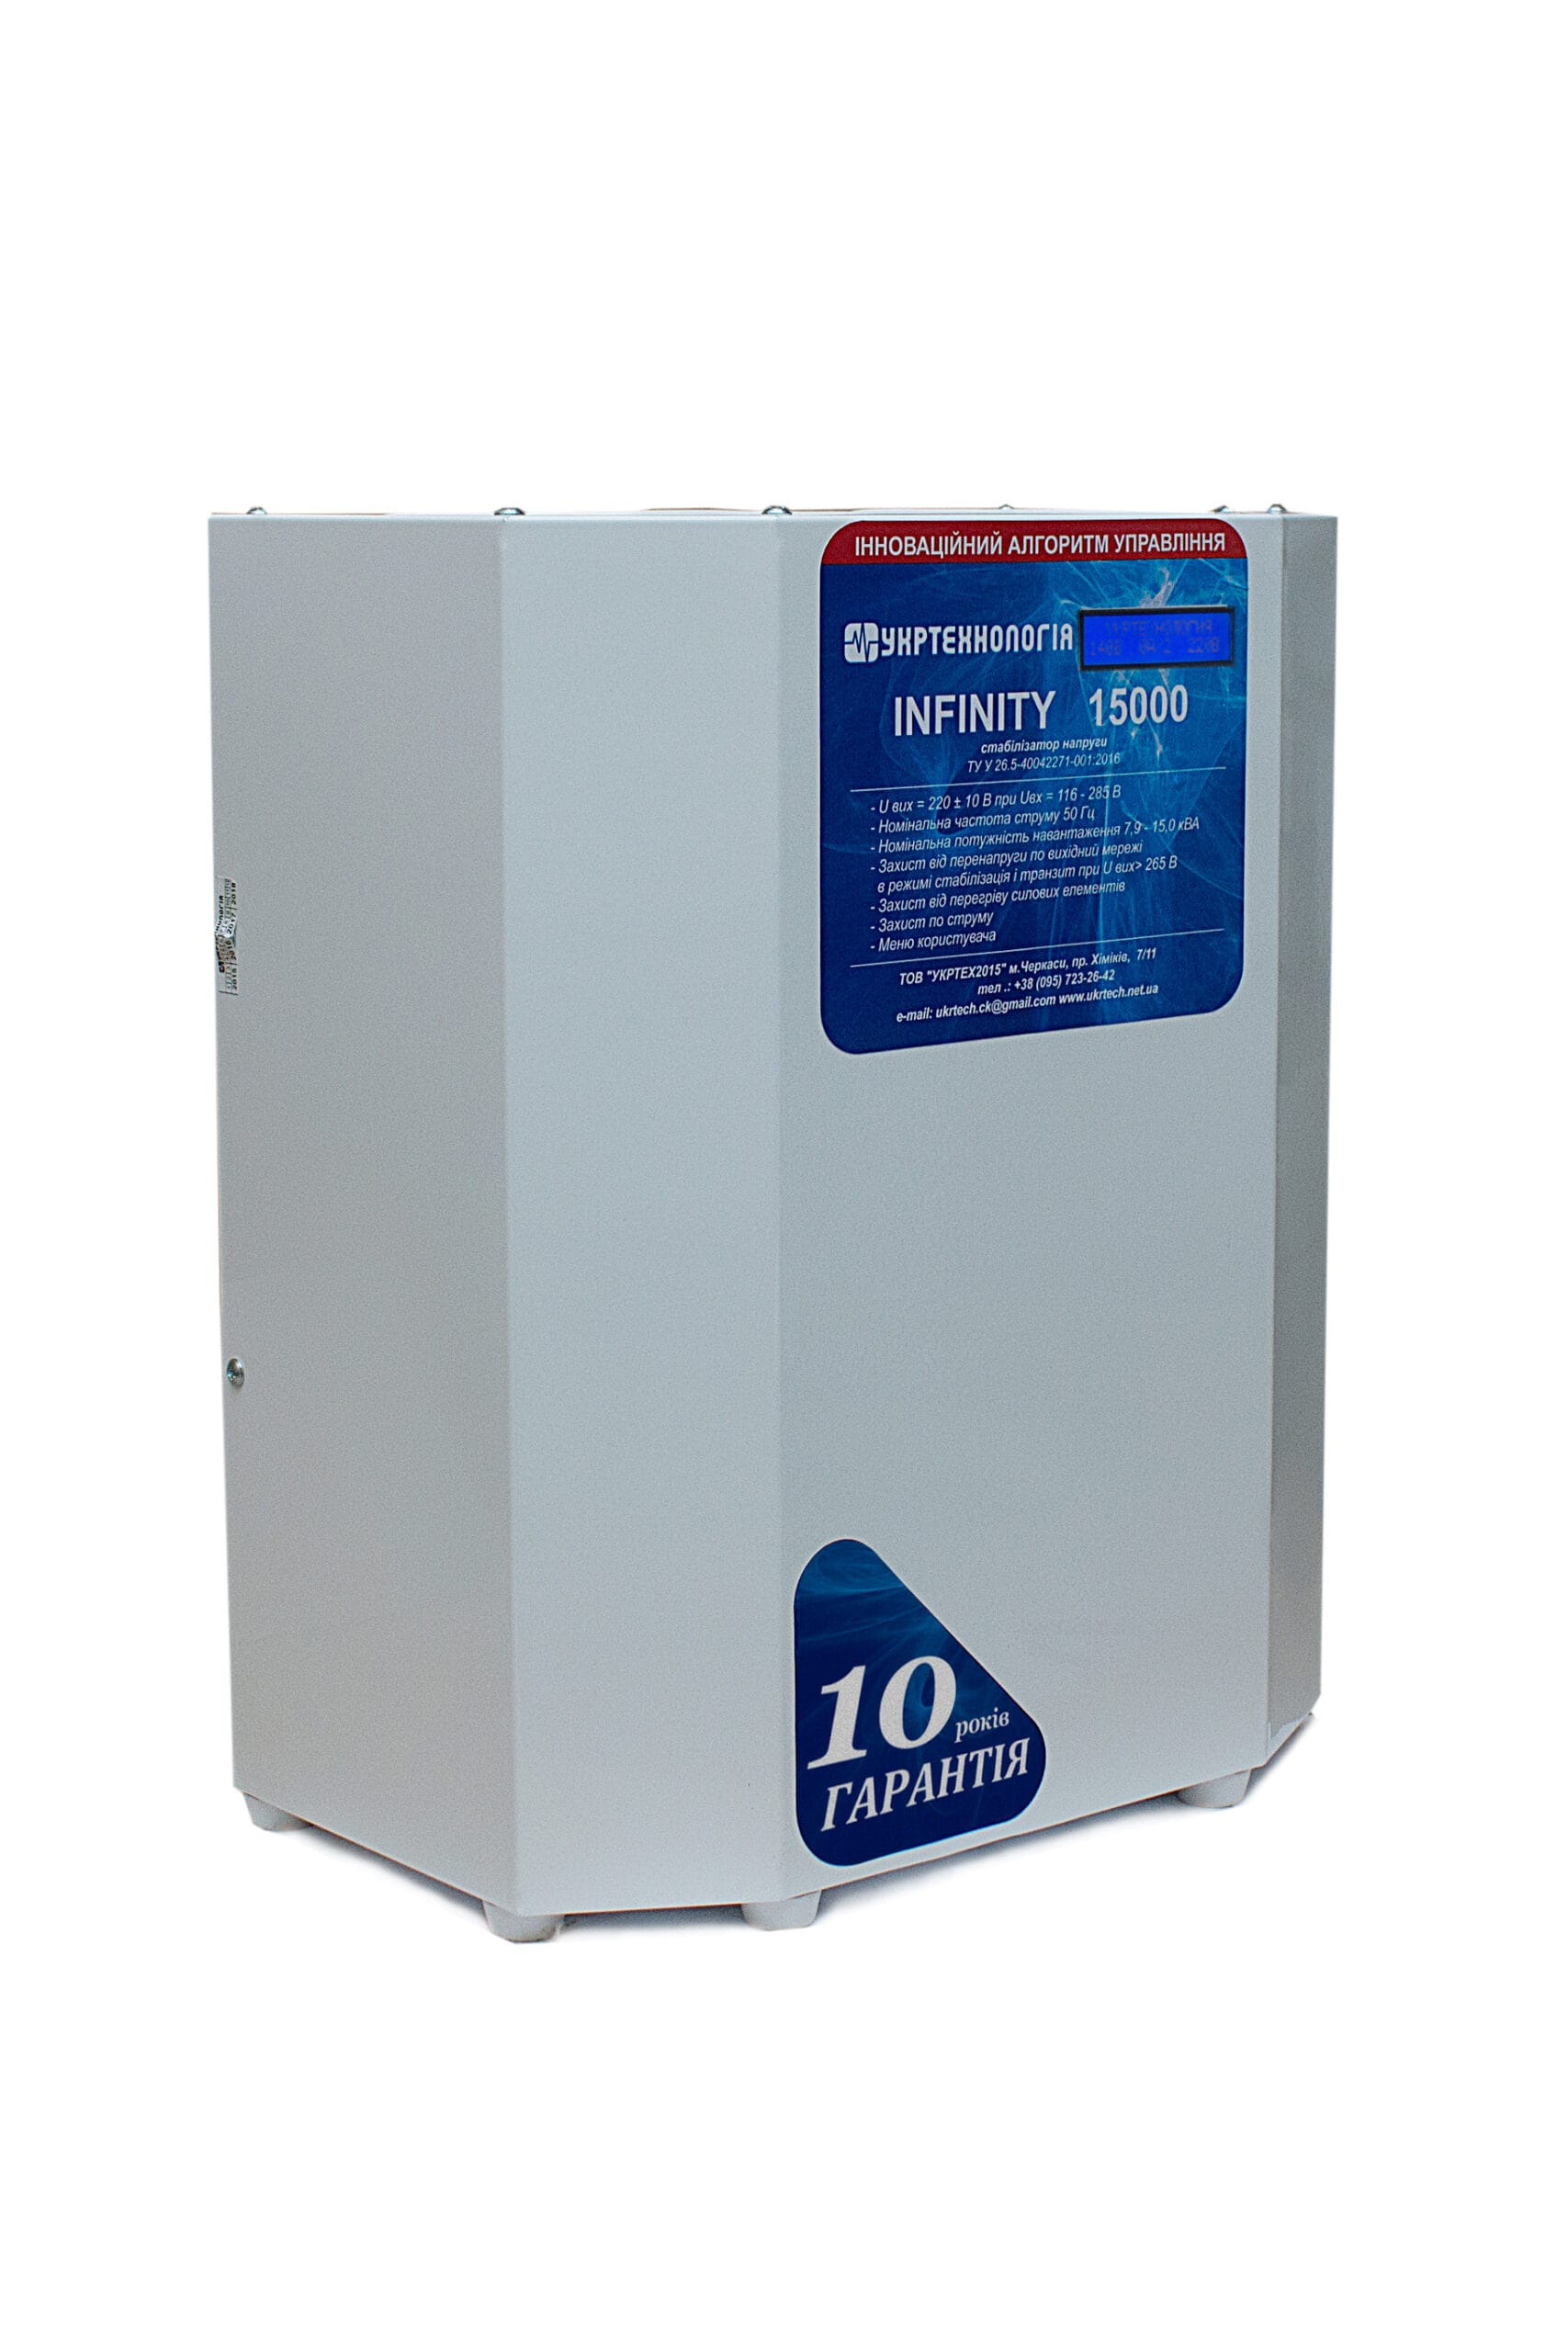 Стабилизаторы напряжения - Стабилизатор напряжения 15 кВт INFINITY 000001414 - Фото 1